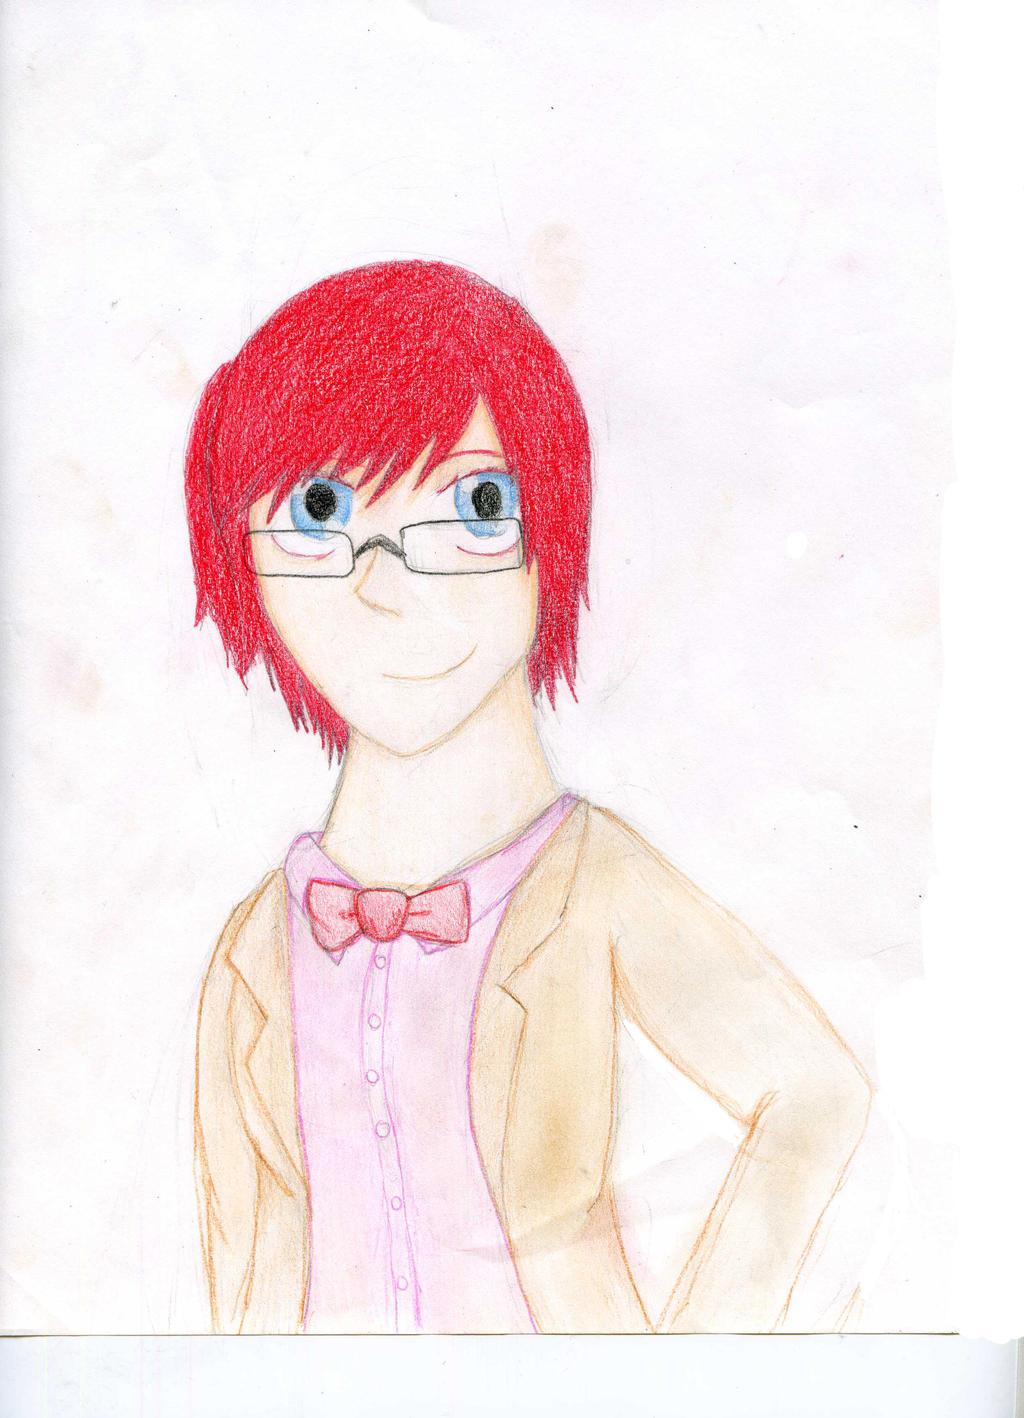 Cywren as the 11th Doctor by AnimeDogz